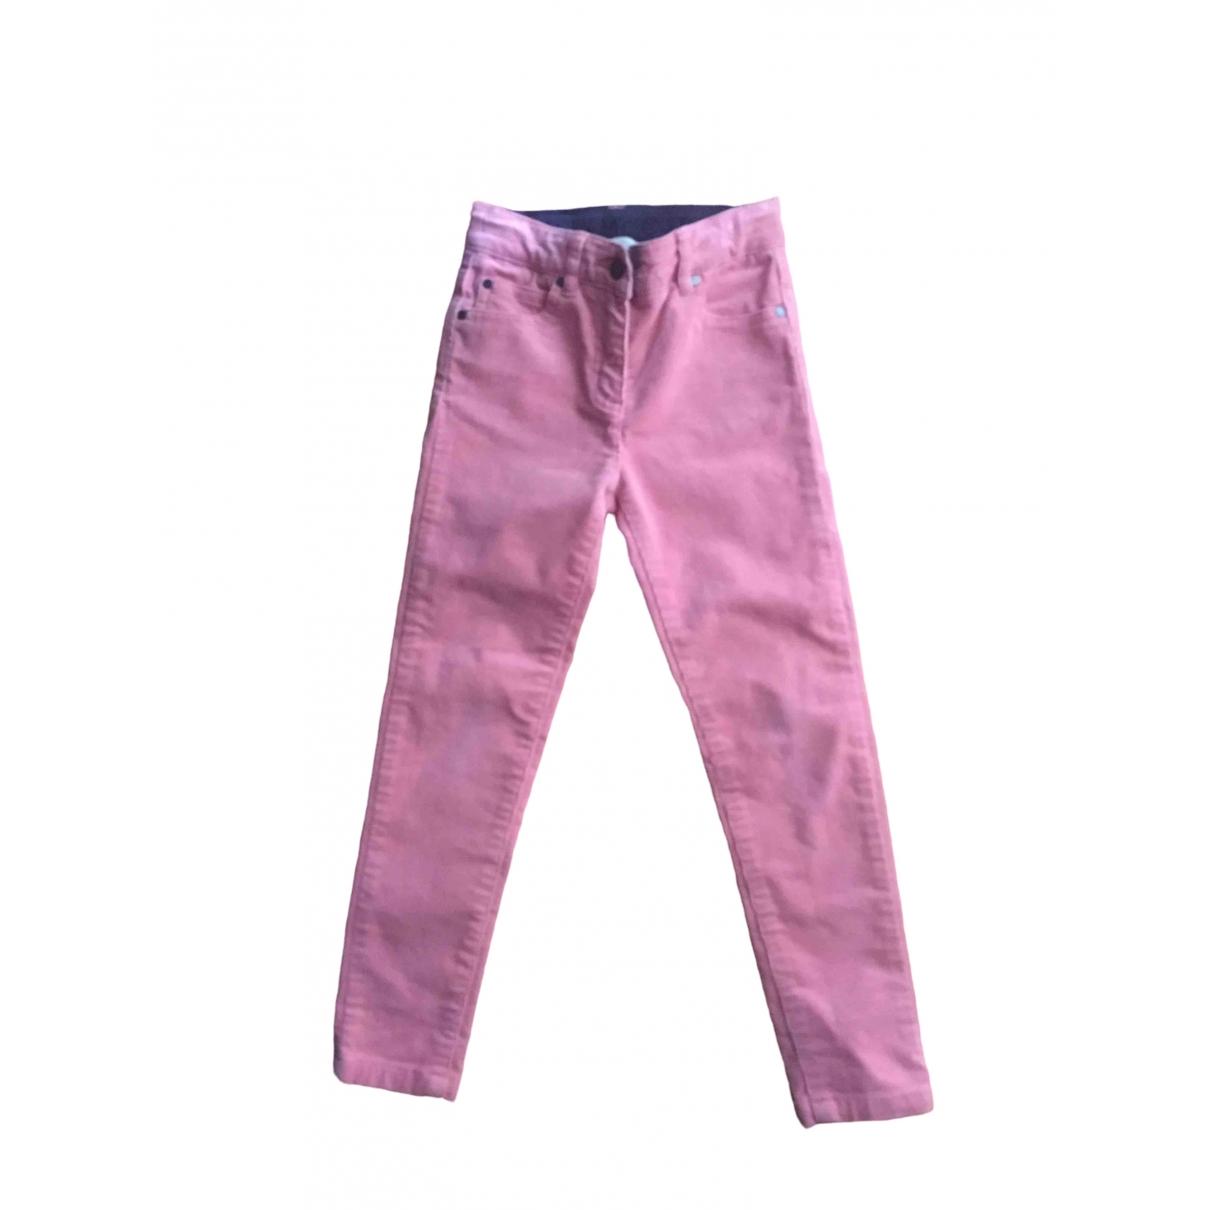 Stella Mccartney \N Pink Velvet Trousers for Kids 6 years - up to 114cm FR